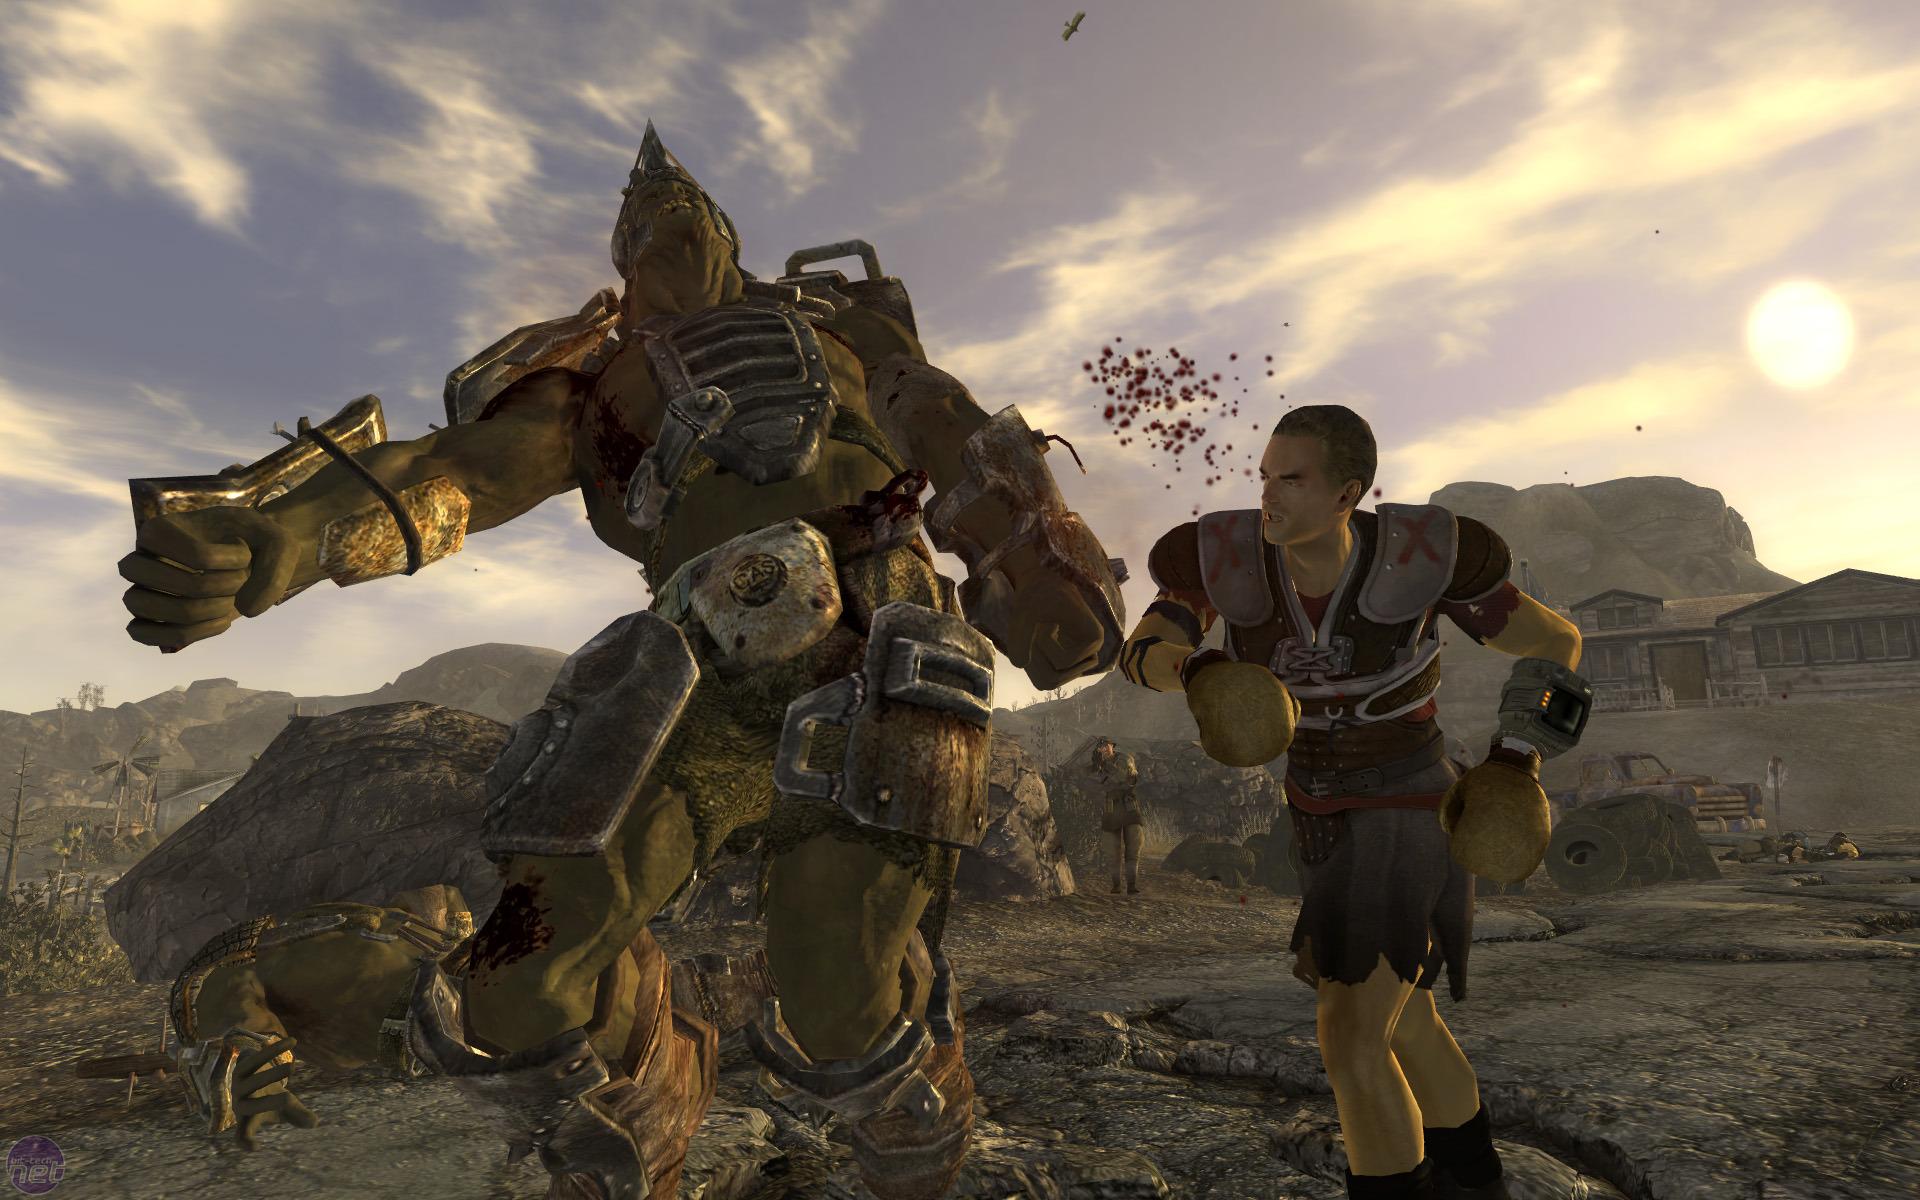 Cowboy Robot Fallout New Vegas Dnp Til 12 Fallout New Vegas